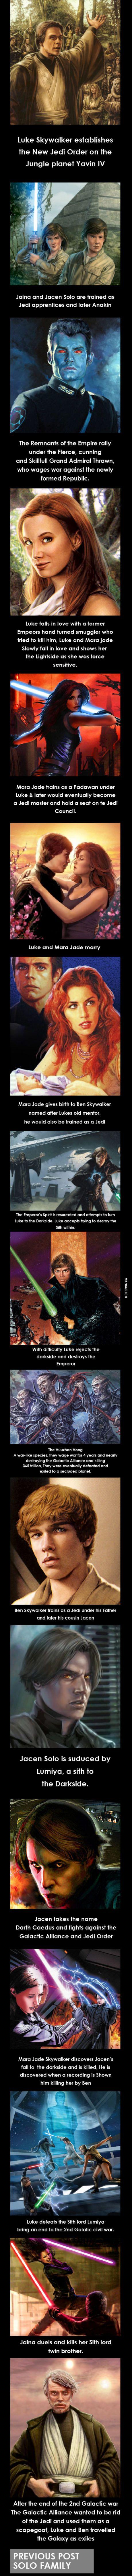 Star Wars History Skywalker Family (Pre Disney)